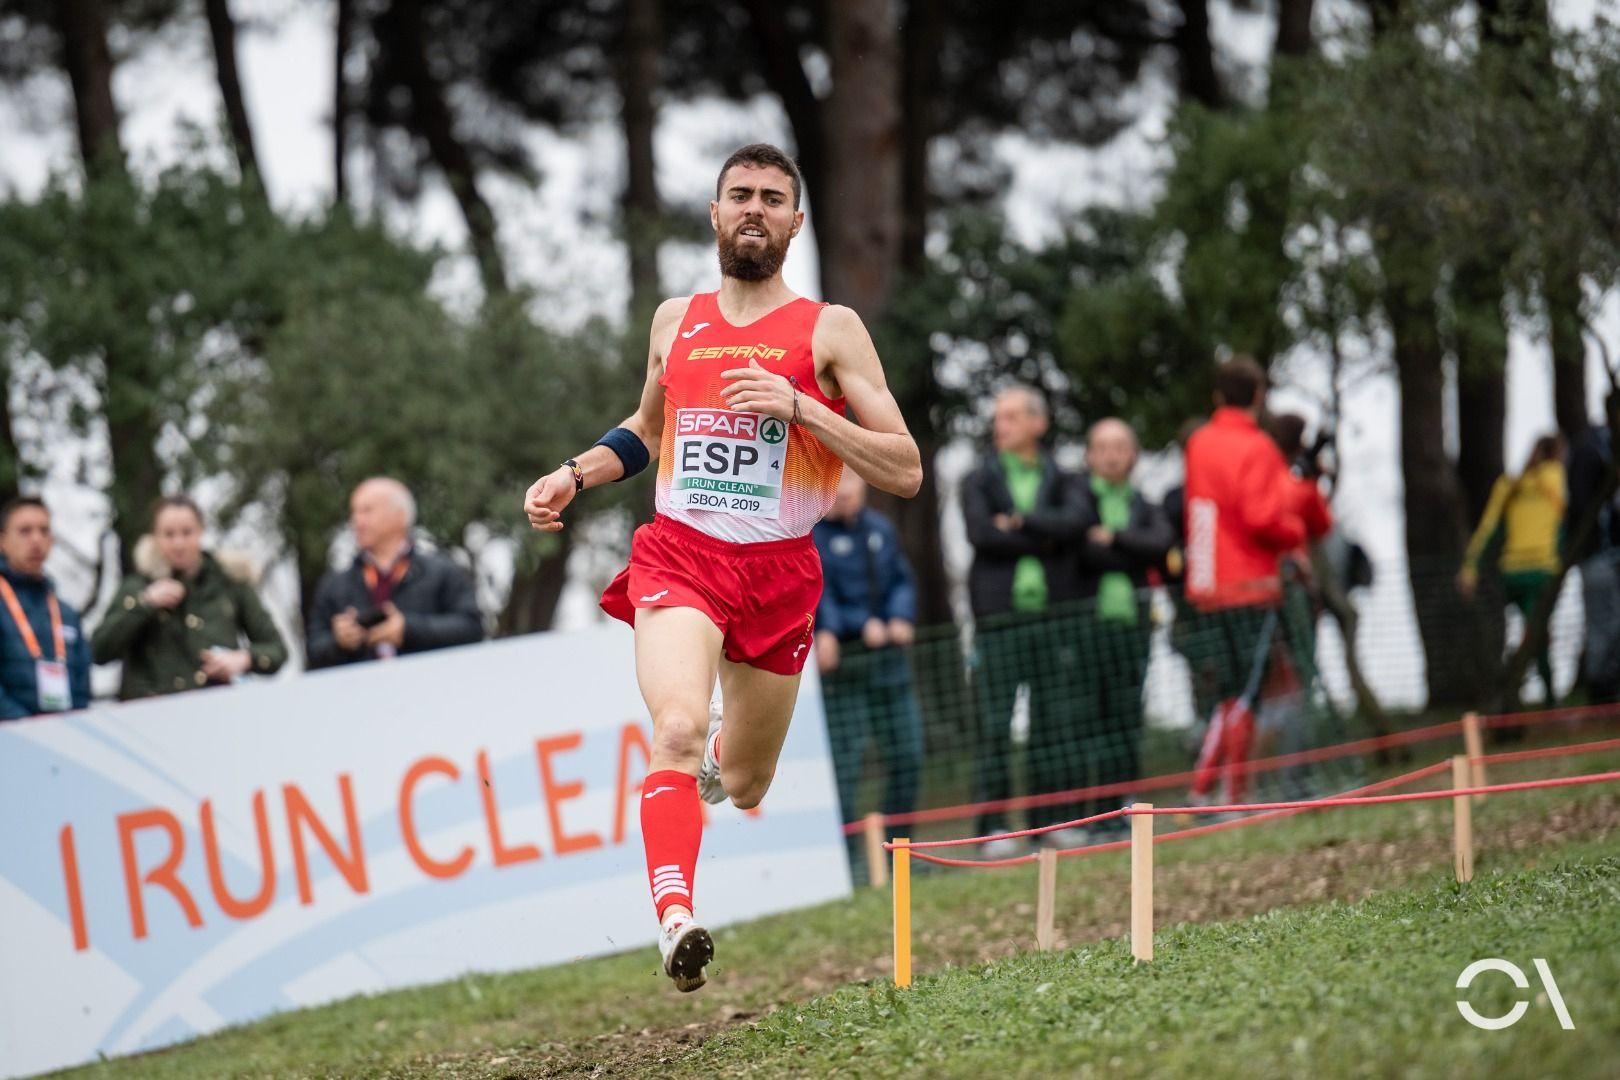 Campeonato de Europa de Cross 2019 | RELEVO MIXTO